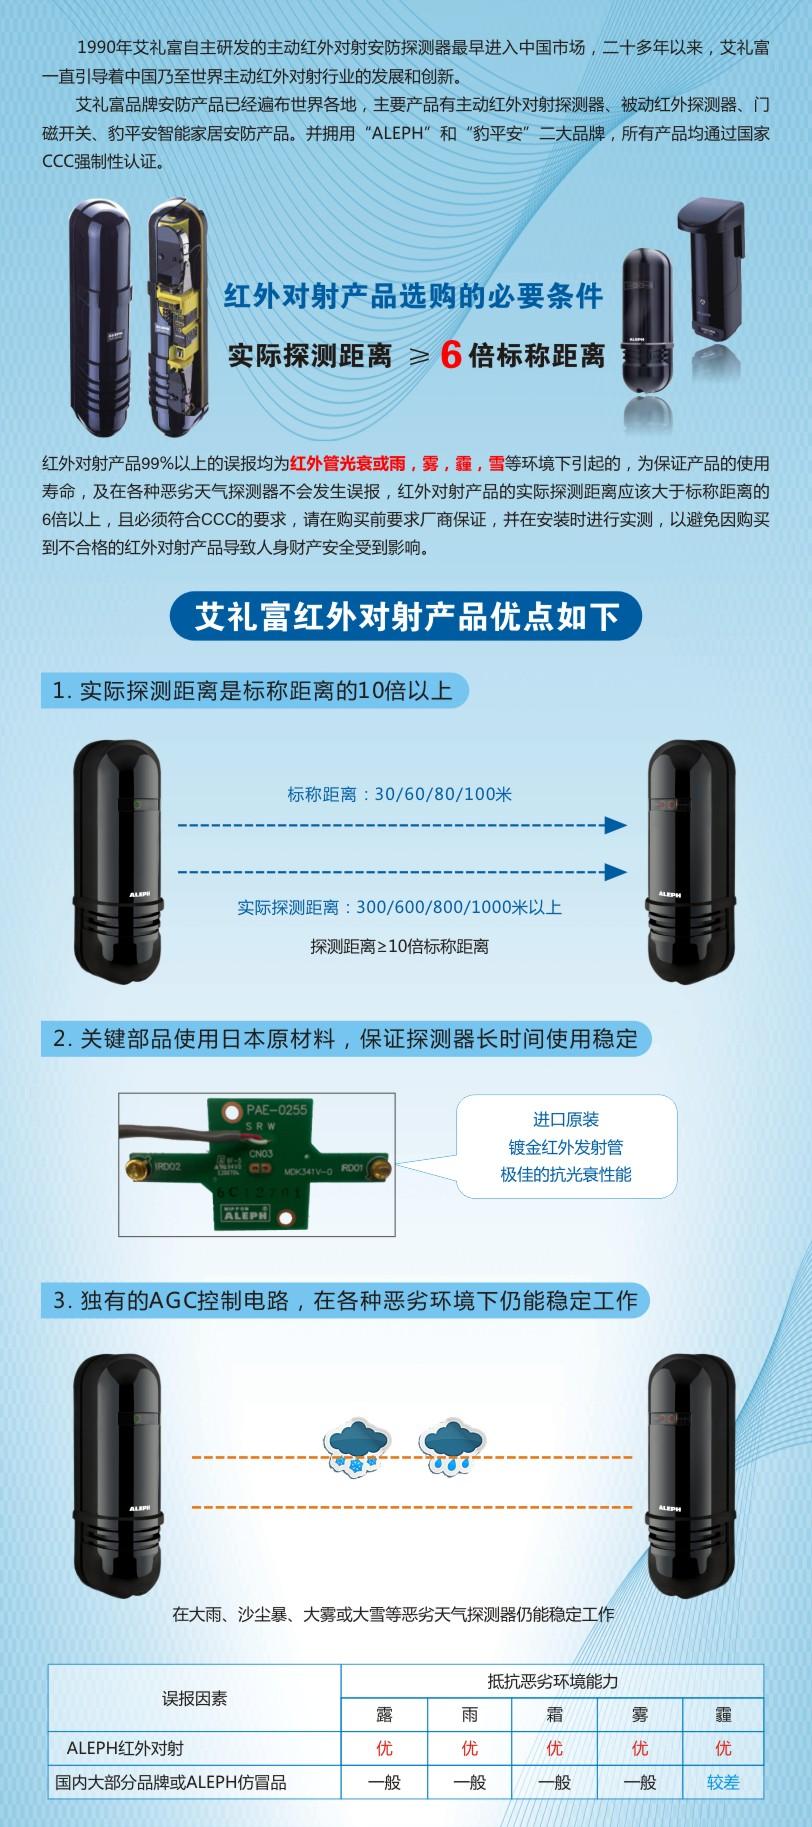 XA-031D/061D/081D/101D 双光束四频段主动红外线警戒探测器